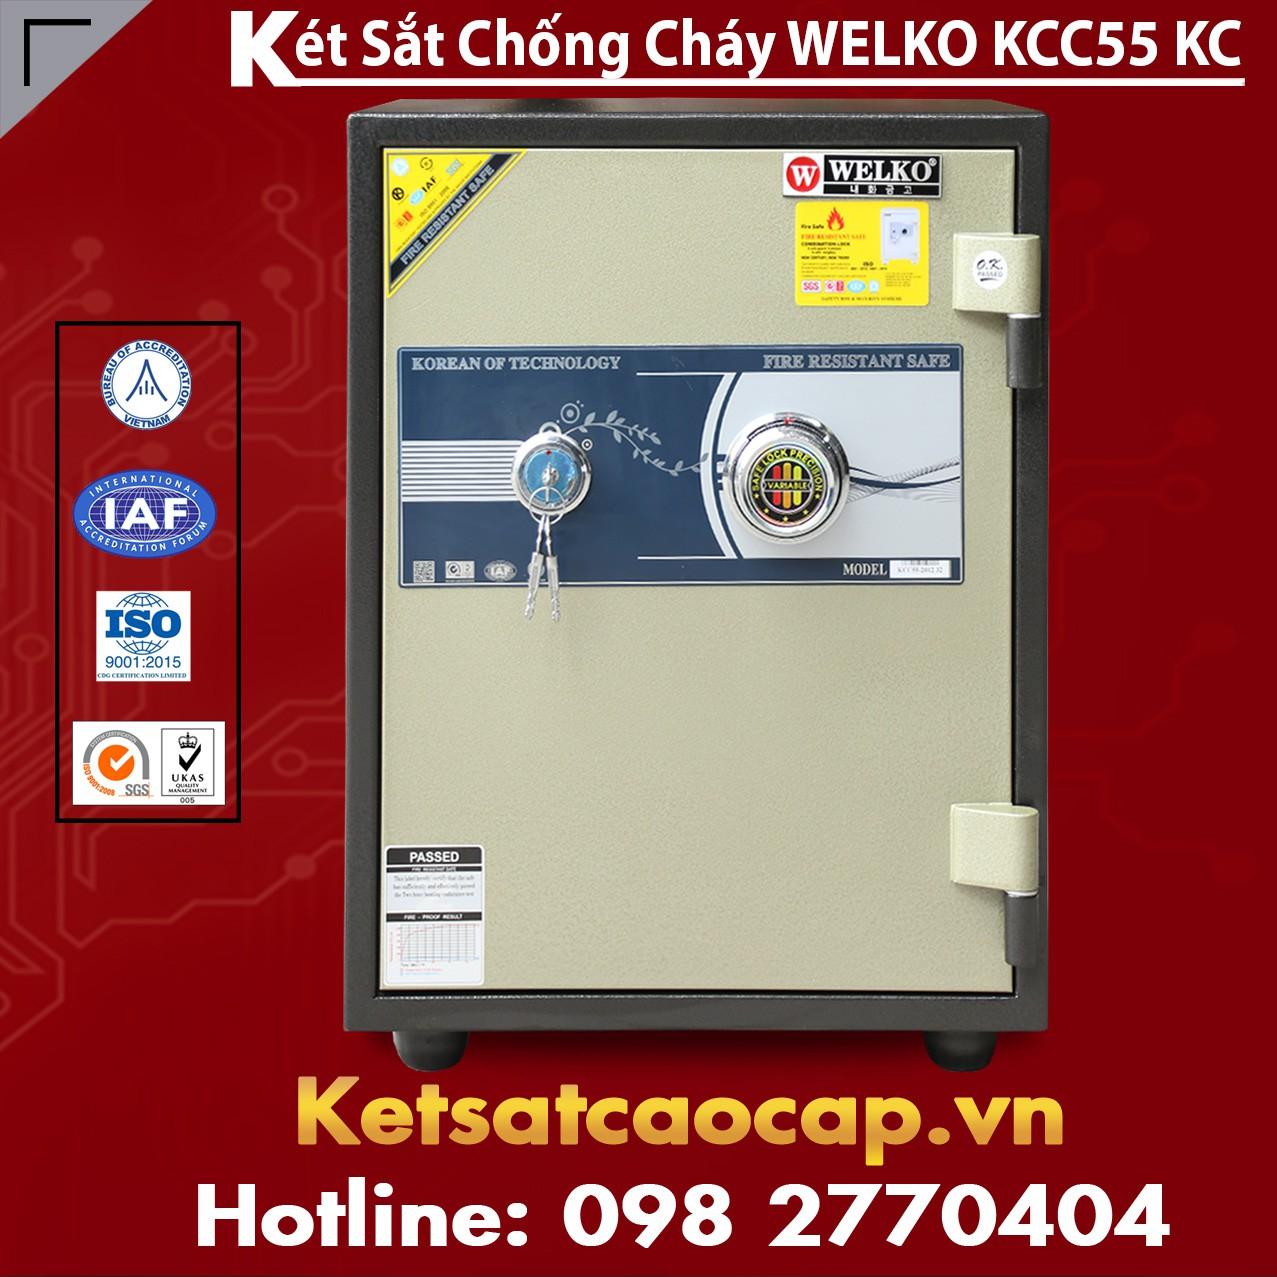 Két Sắt Bình Dương WELKO KCC55 KC